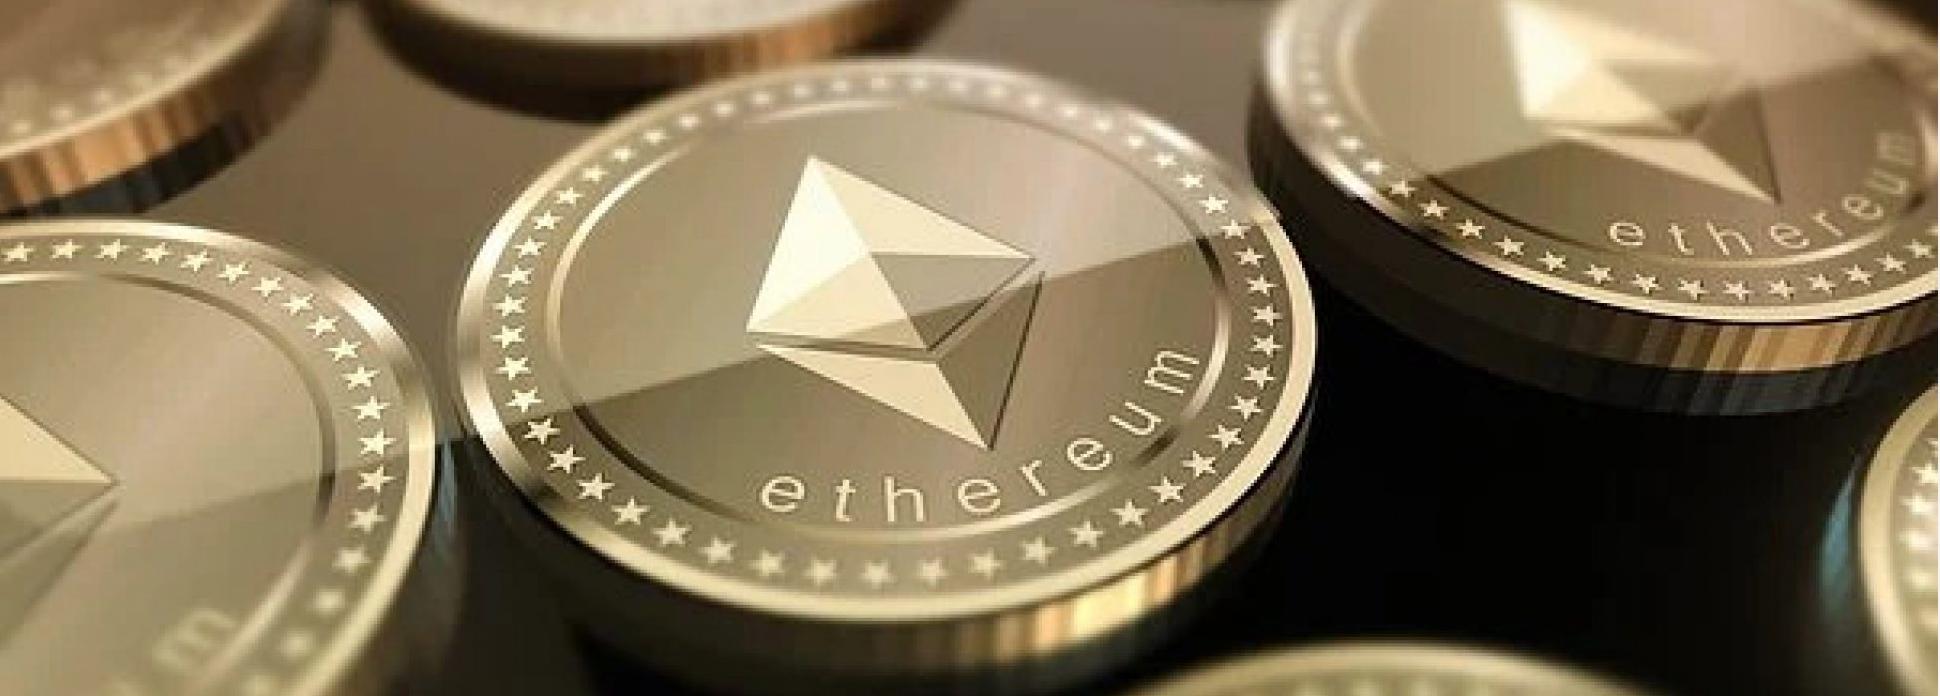 Ethereum nr. 1 cryptomunt